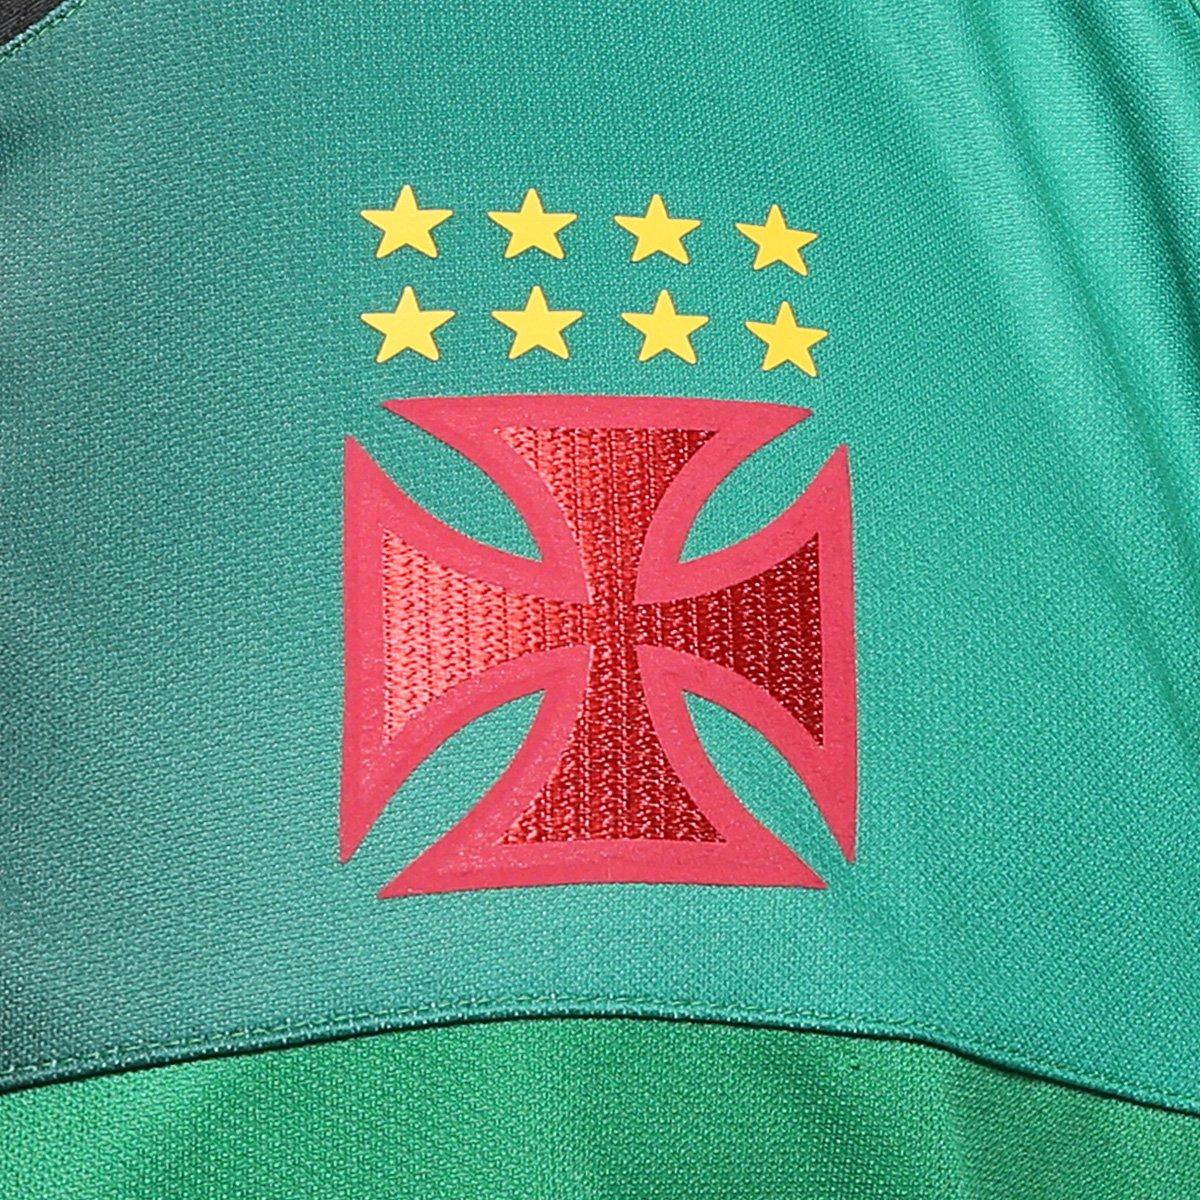 Camisa Vasco Goleiro 17 18 s nº Torcedor Umbro Masculina - Verde e ... 118bb2a2db257